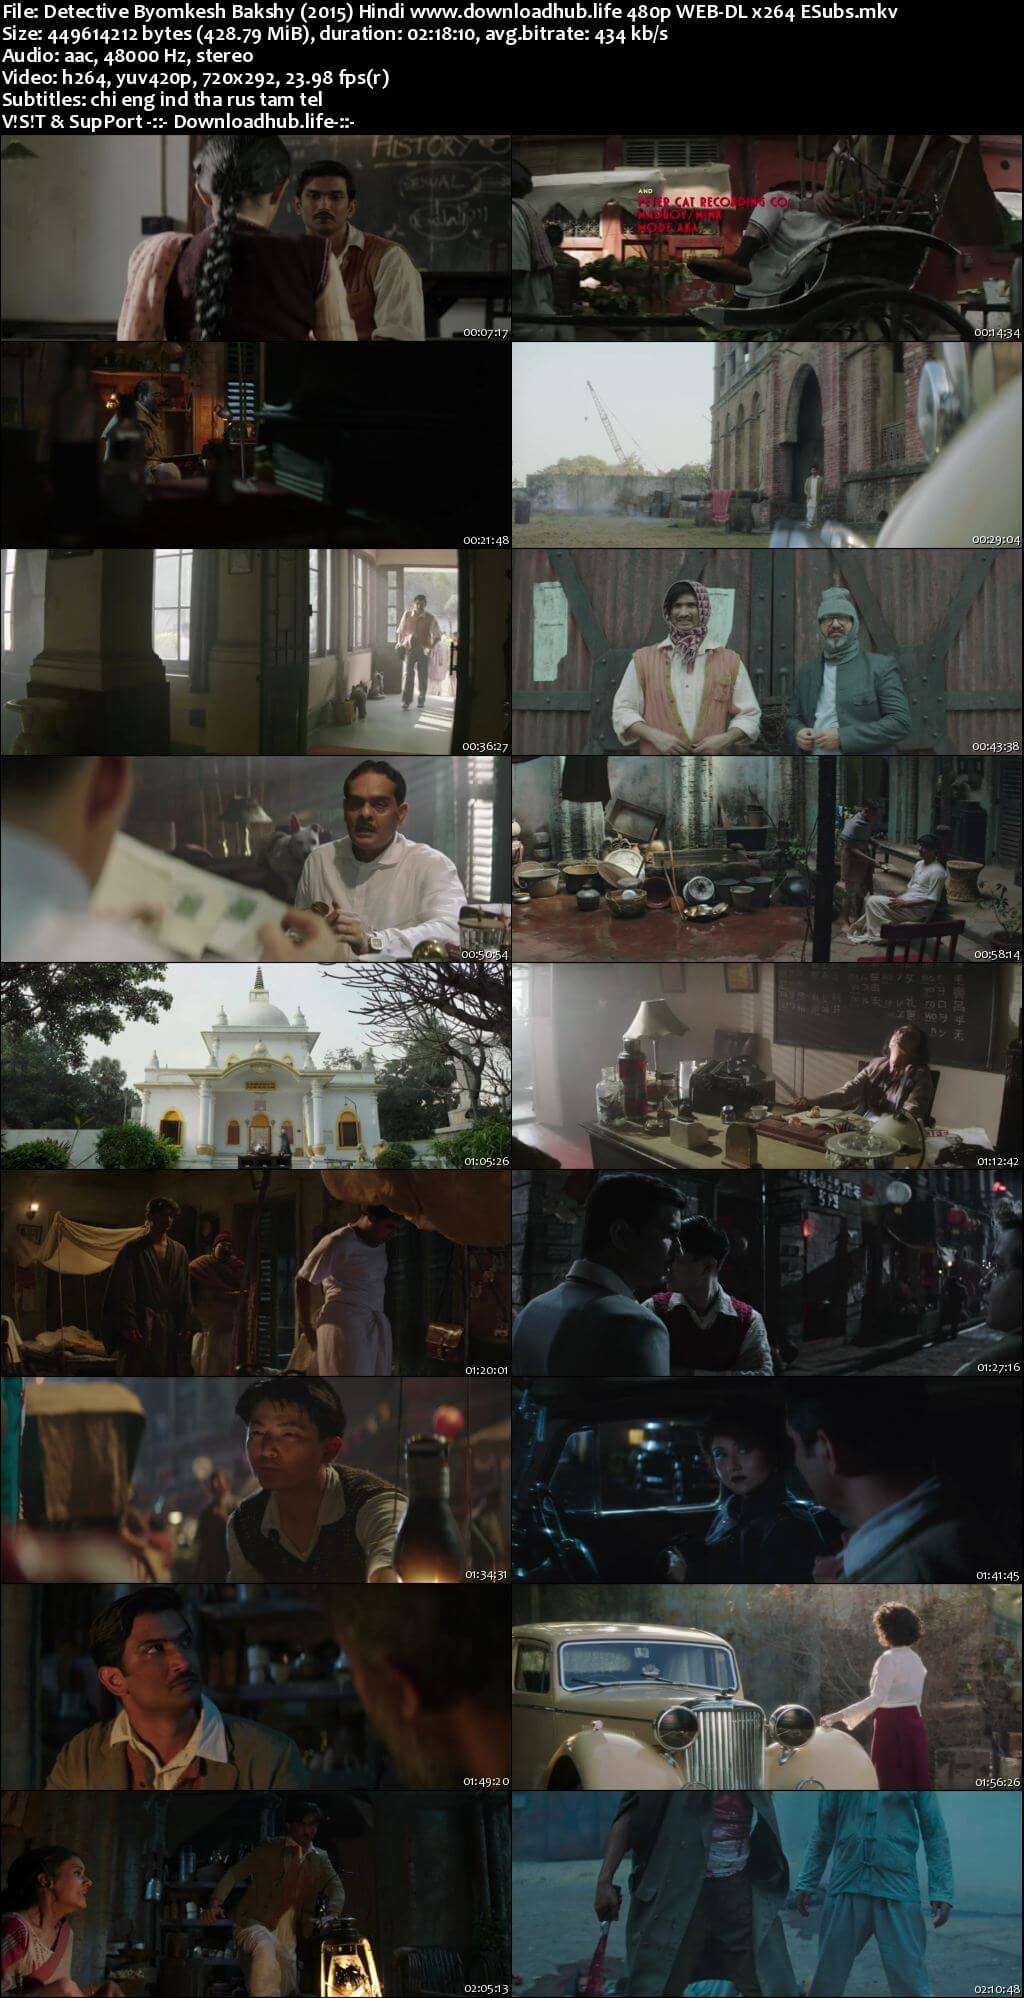 Detective Byomkesh Bakshy 2015 Hindi 400MB HDRip 480p MSubs